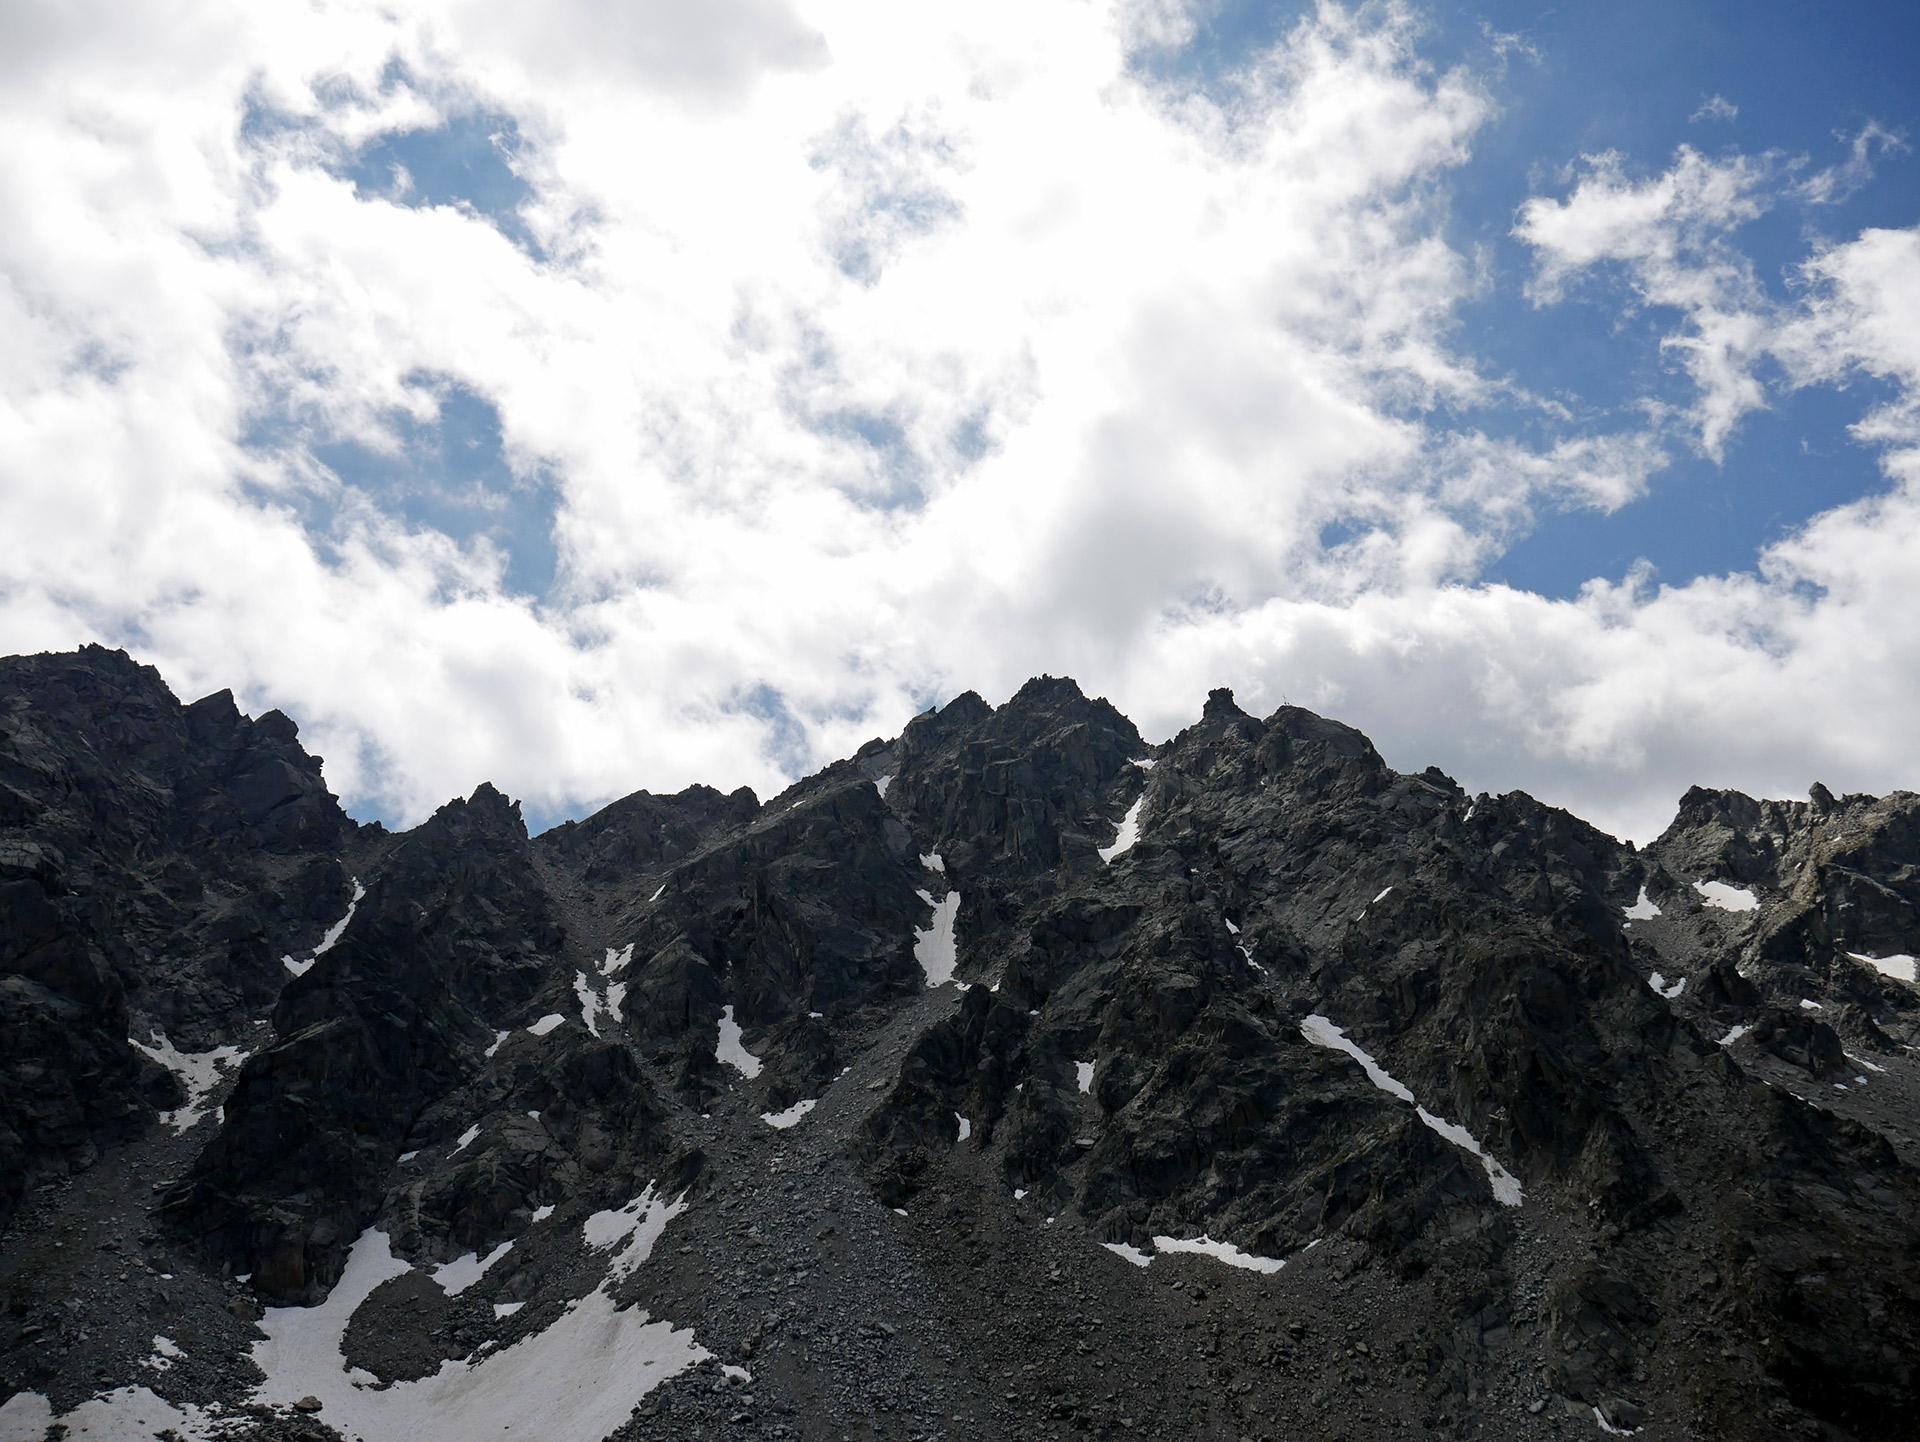 Klettersteig Nauders : Top tipps vom bergführer nauders tirol outdoor